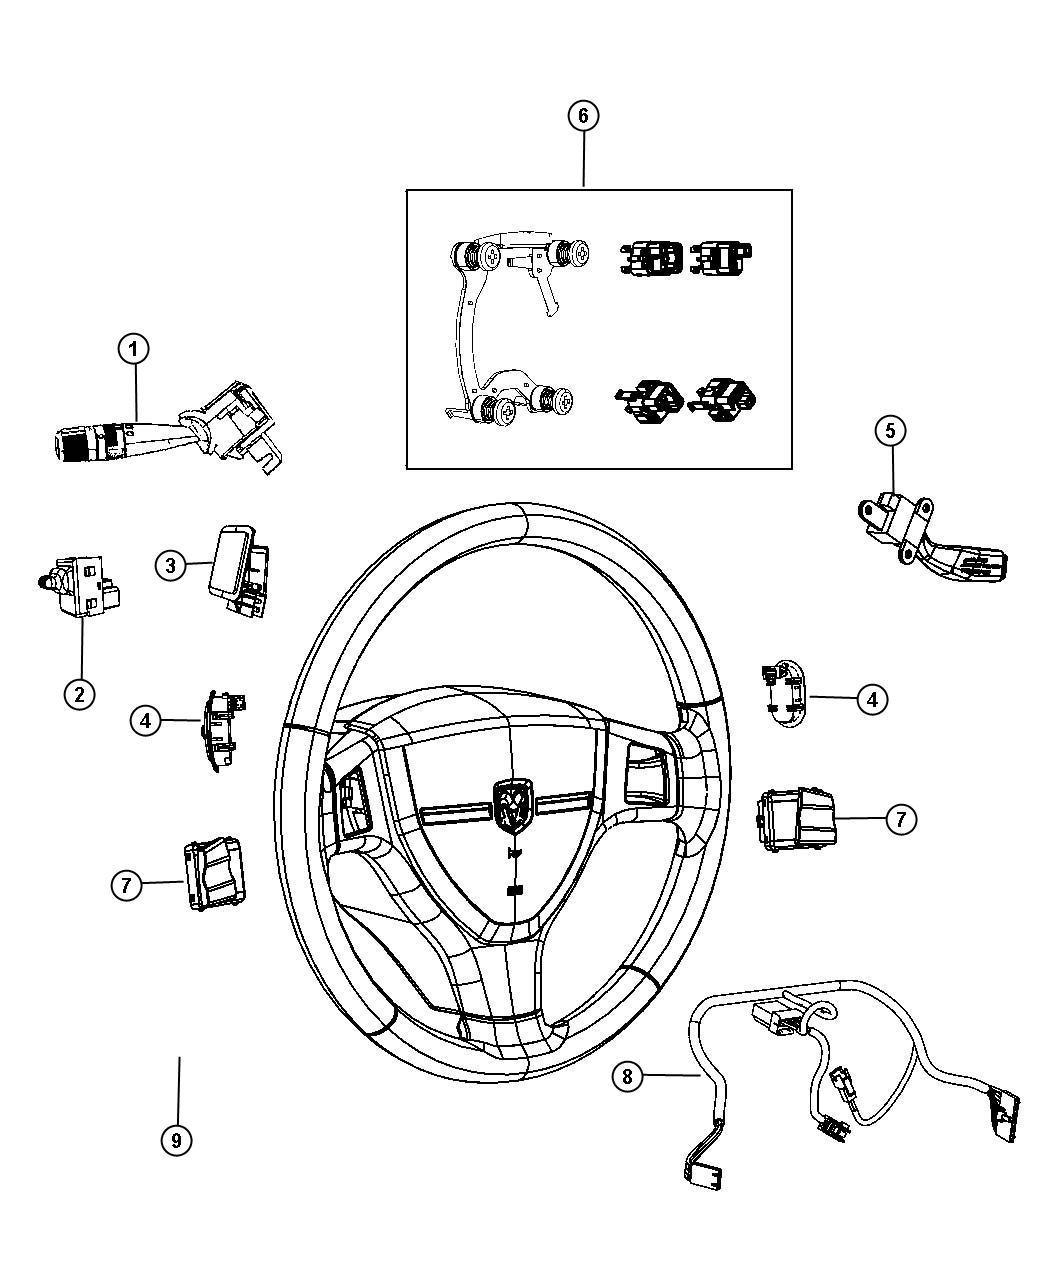 2013 Dodge Ram 1500 Wiring. Steering wheel. Trim: [no